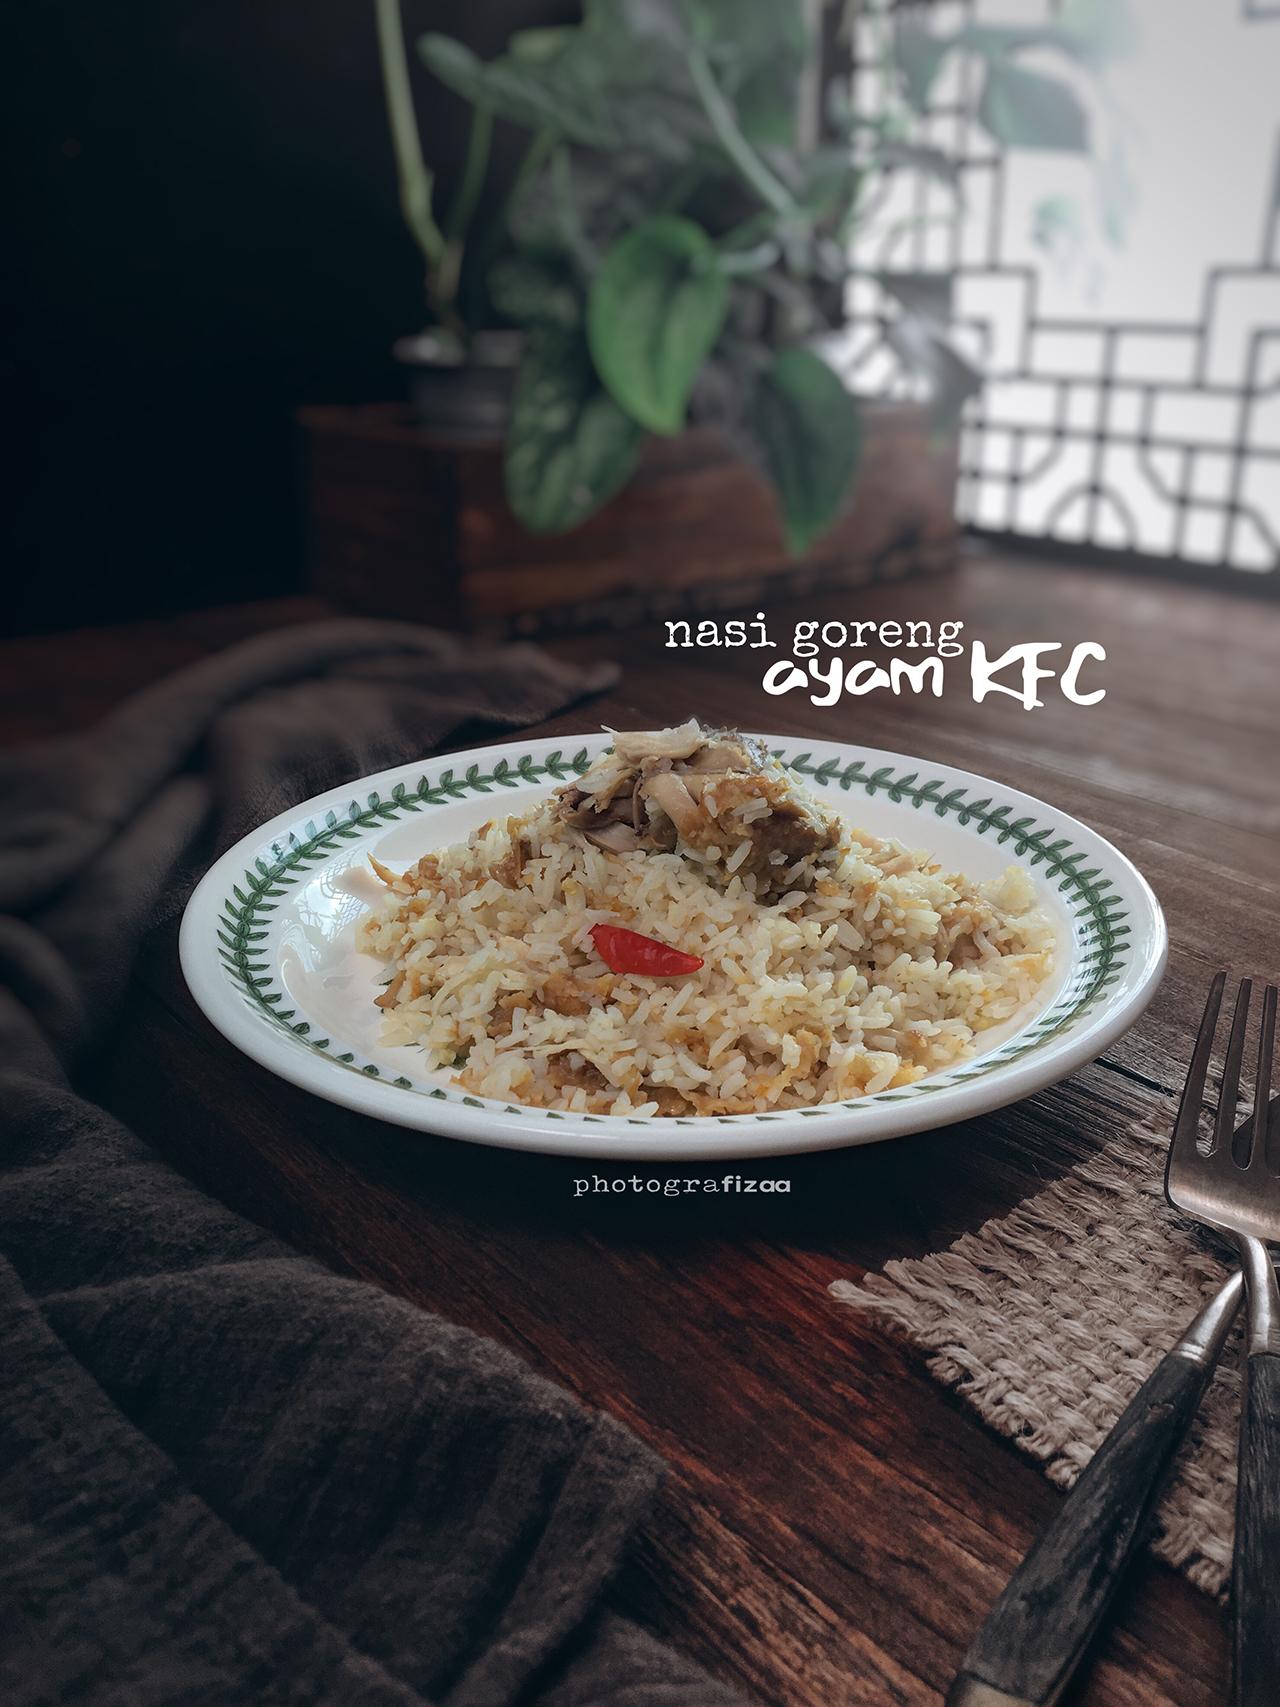 Resepi Nasi Goreng Ayam KFC Viral